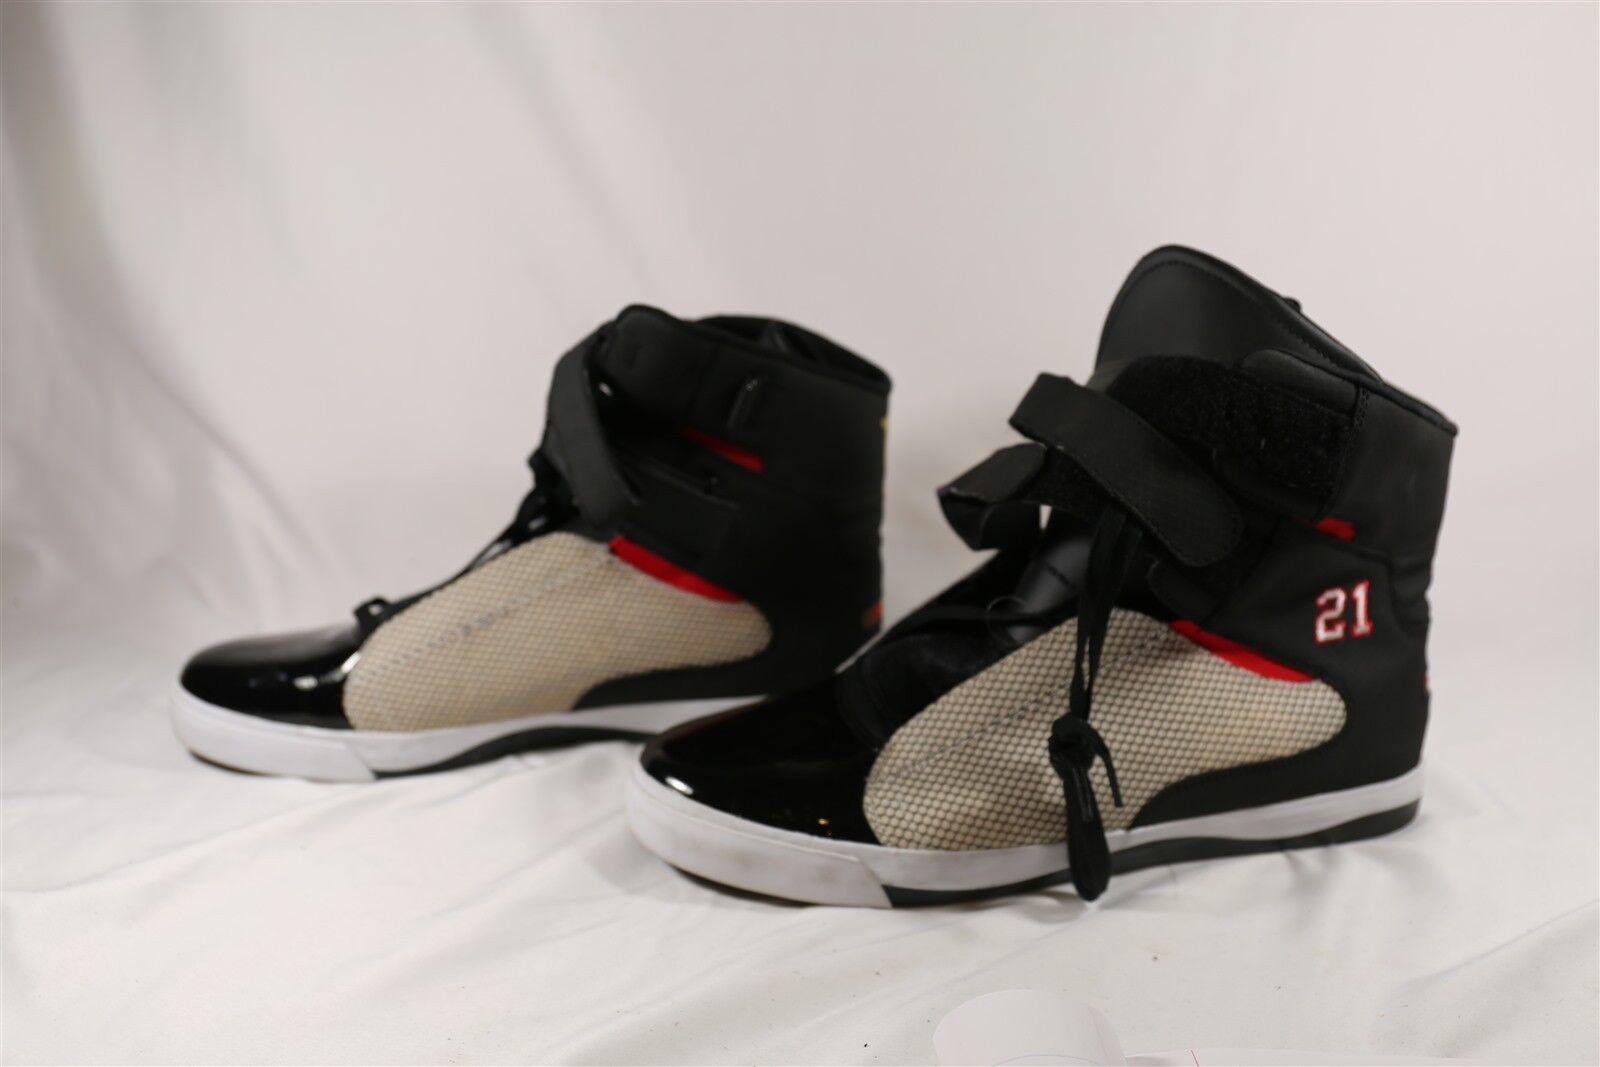 Super Rare Supra Deion Sanders Primetime 21 Made HOF Induction shoes Size 15 WOW